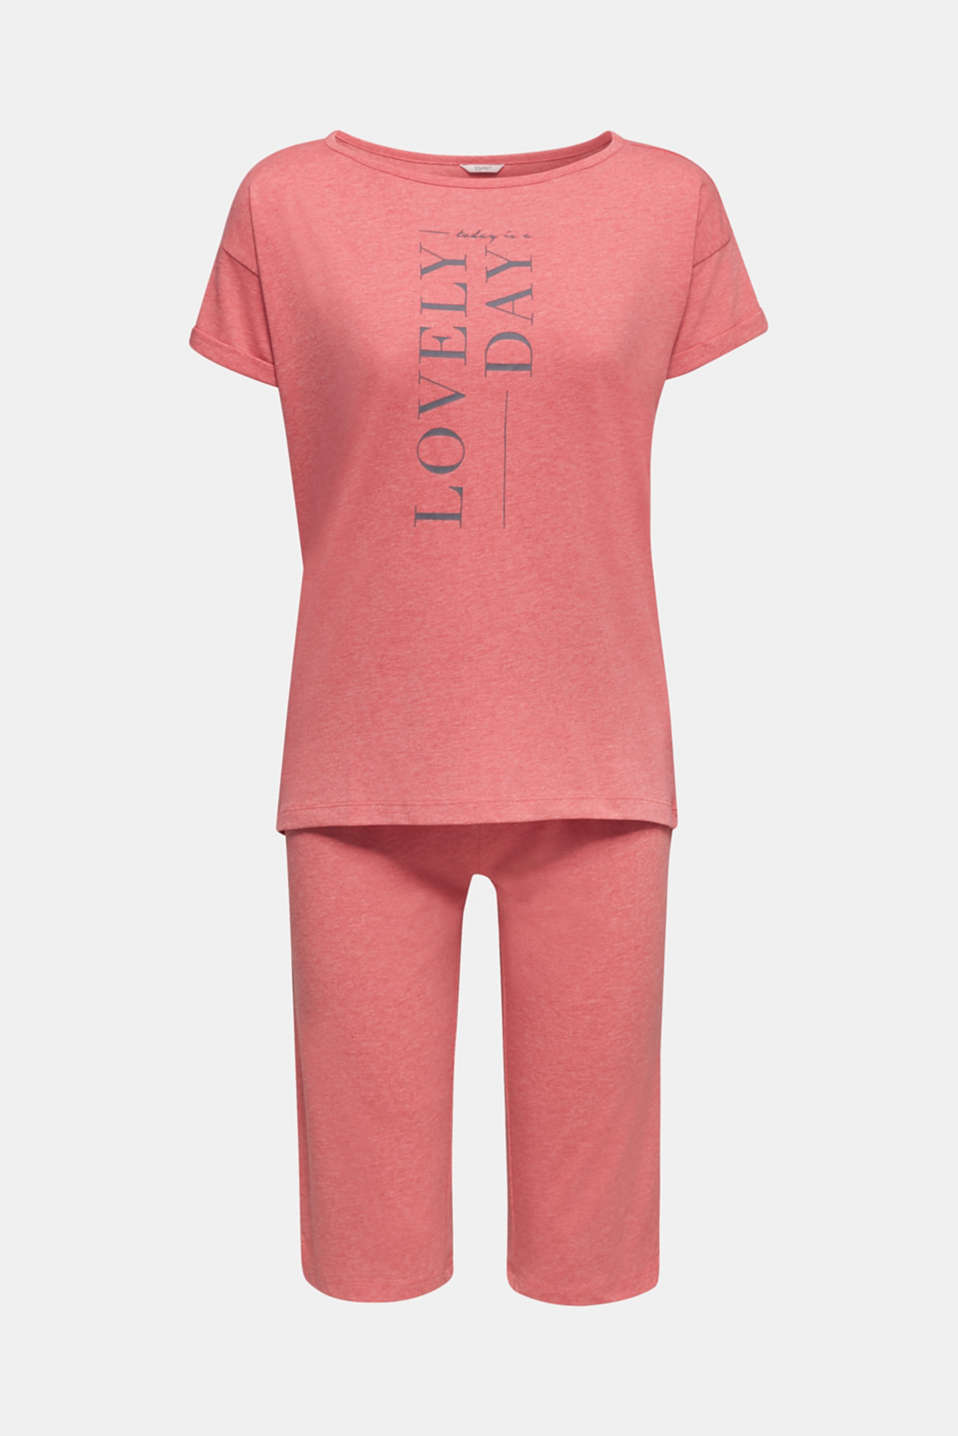 Blended cotton jersey pyjamas, CORAL RED, detail image number 6